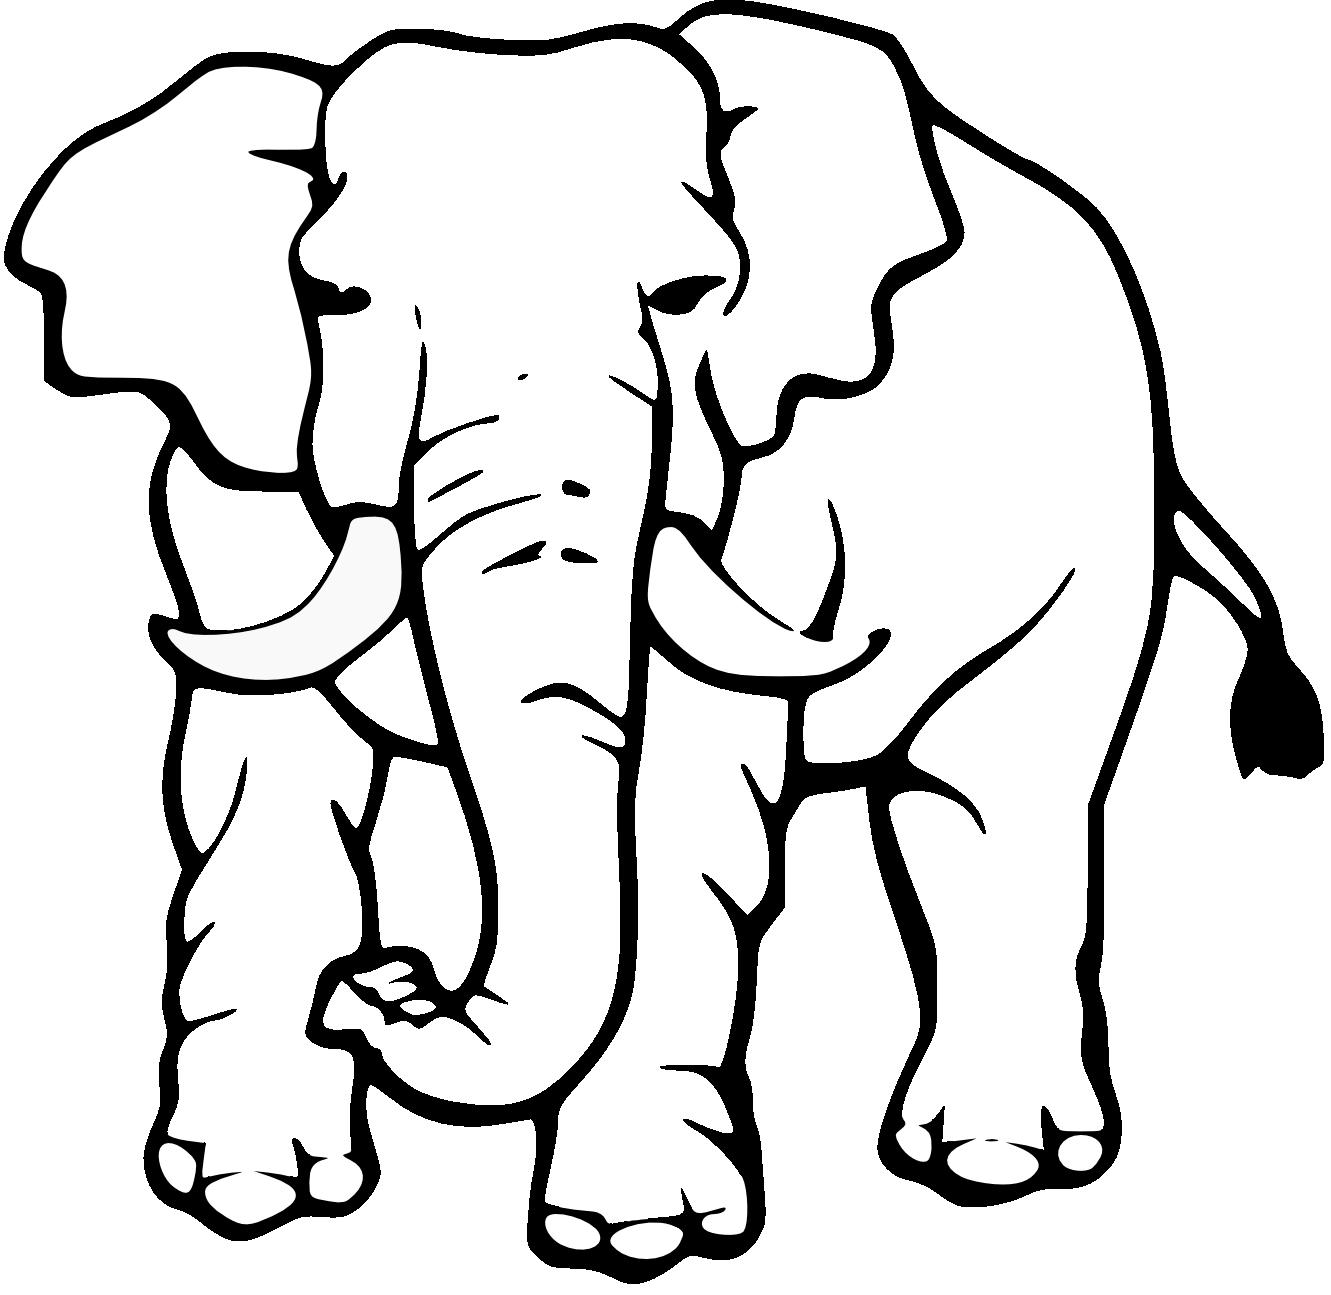 Elephant Clip Art Black And White Black -Elephant Clip Art Black And White Black And White Elephant Drawing-5